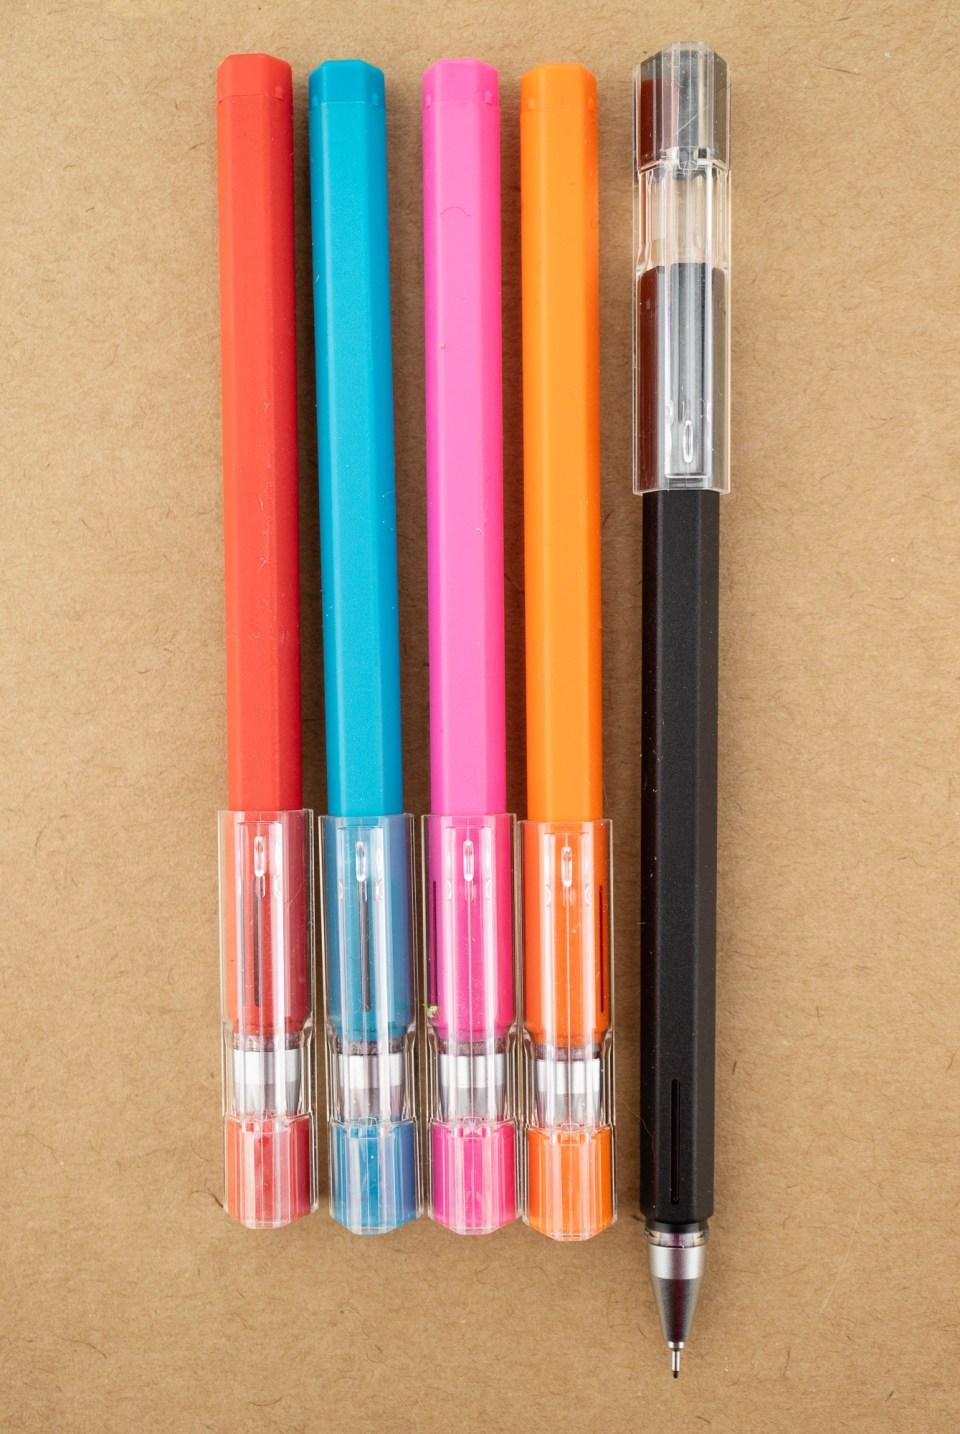 Muji Gel Pens 0.25mm